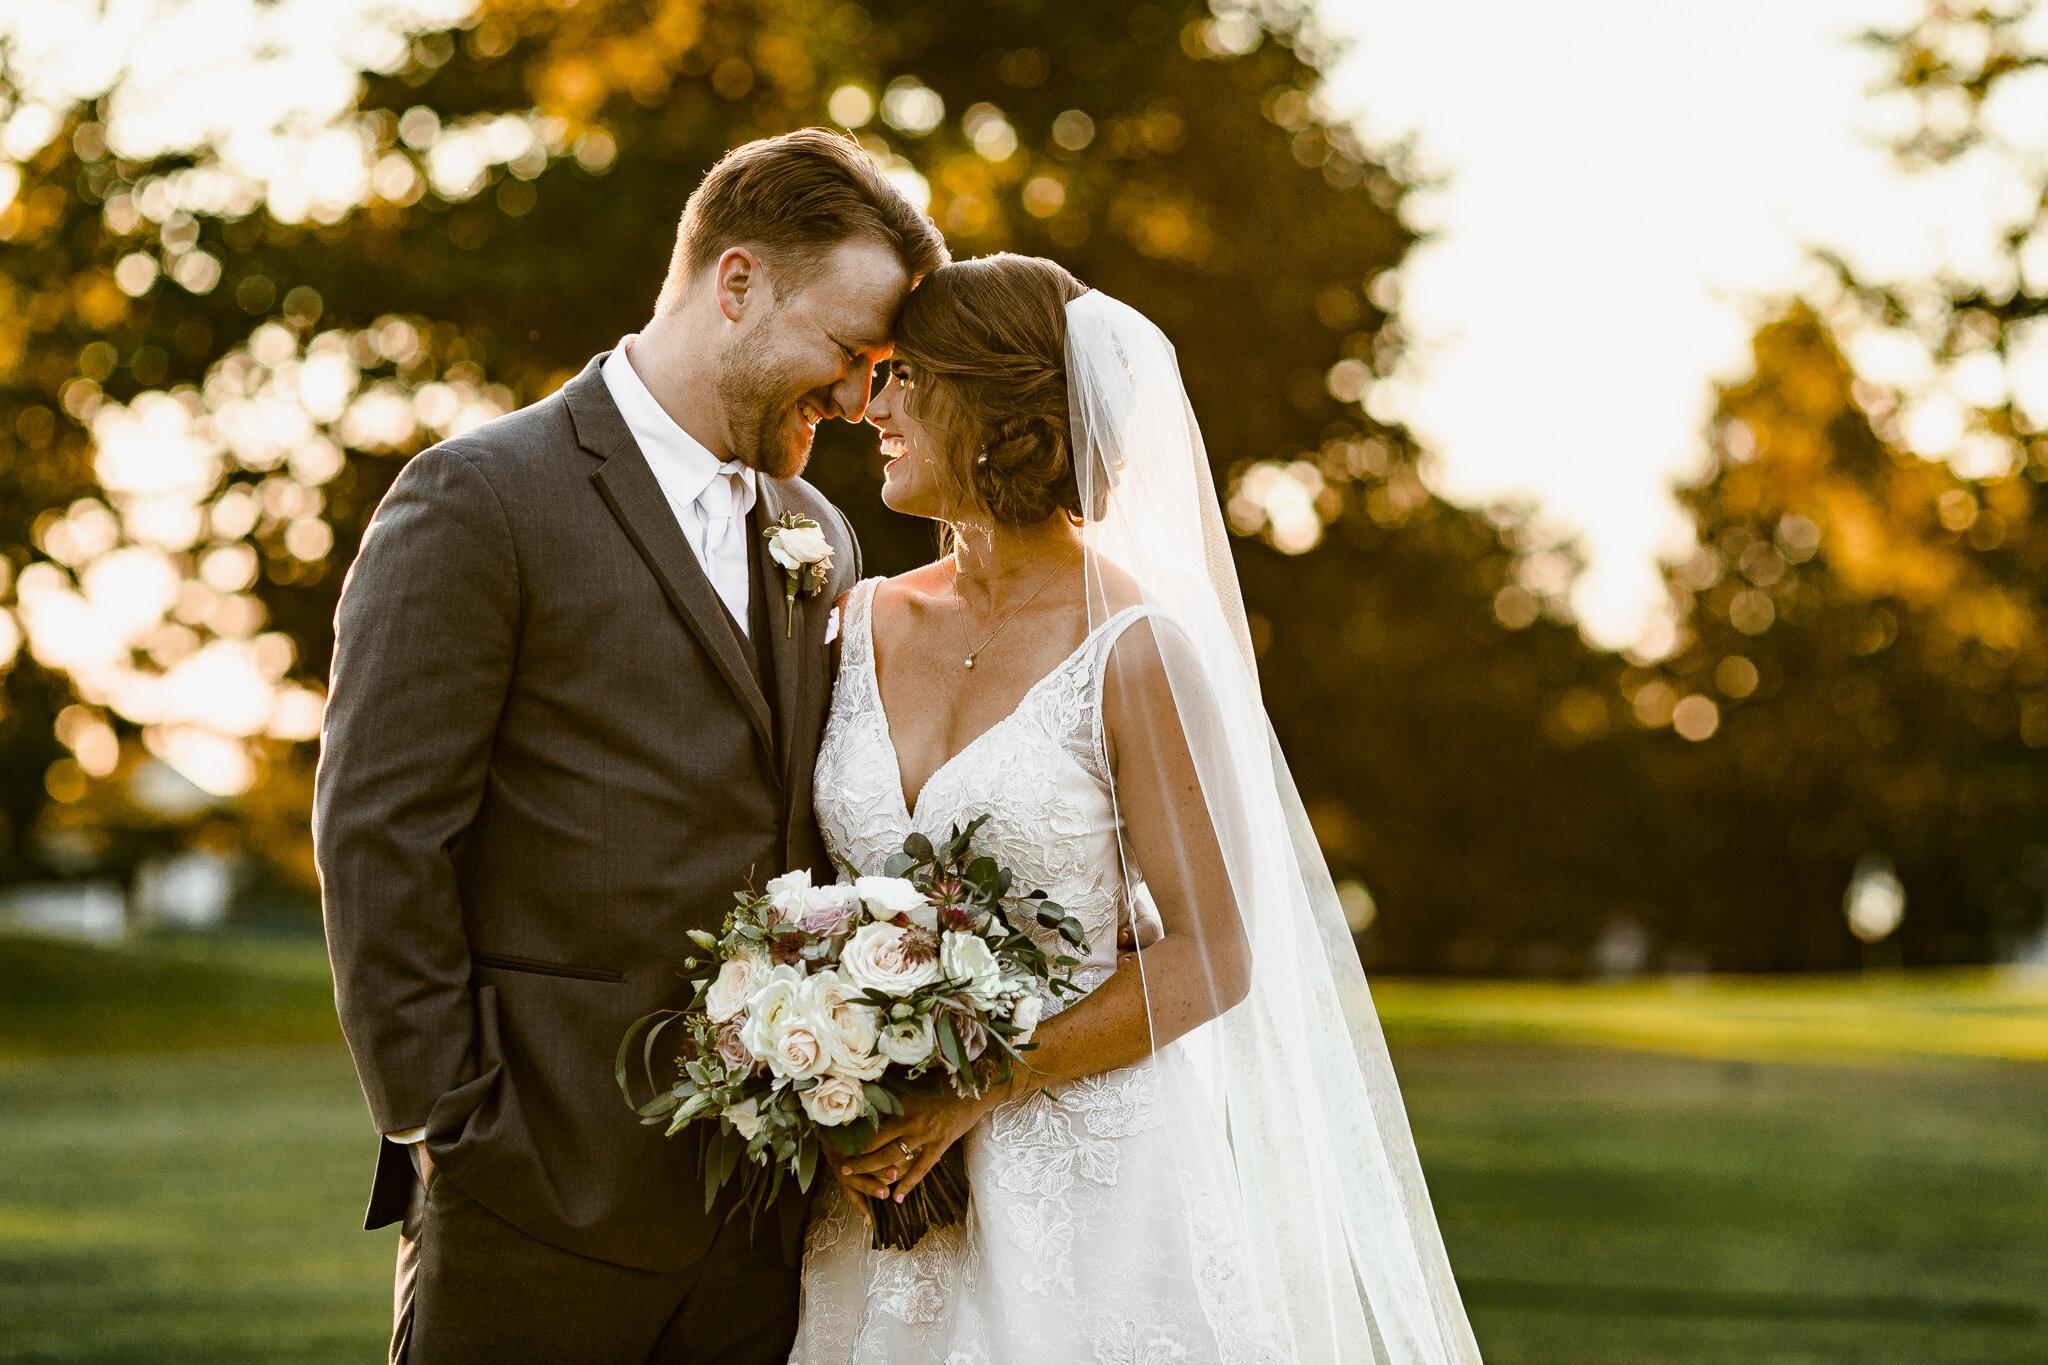 Coyle-Forsgate-Country-Club-Wedding-Photographer-23.JPG